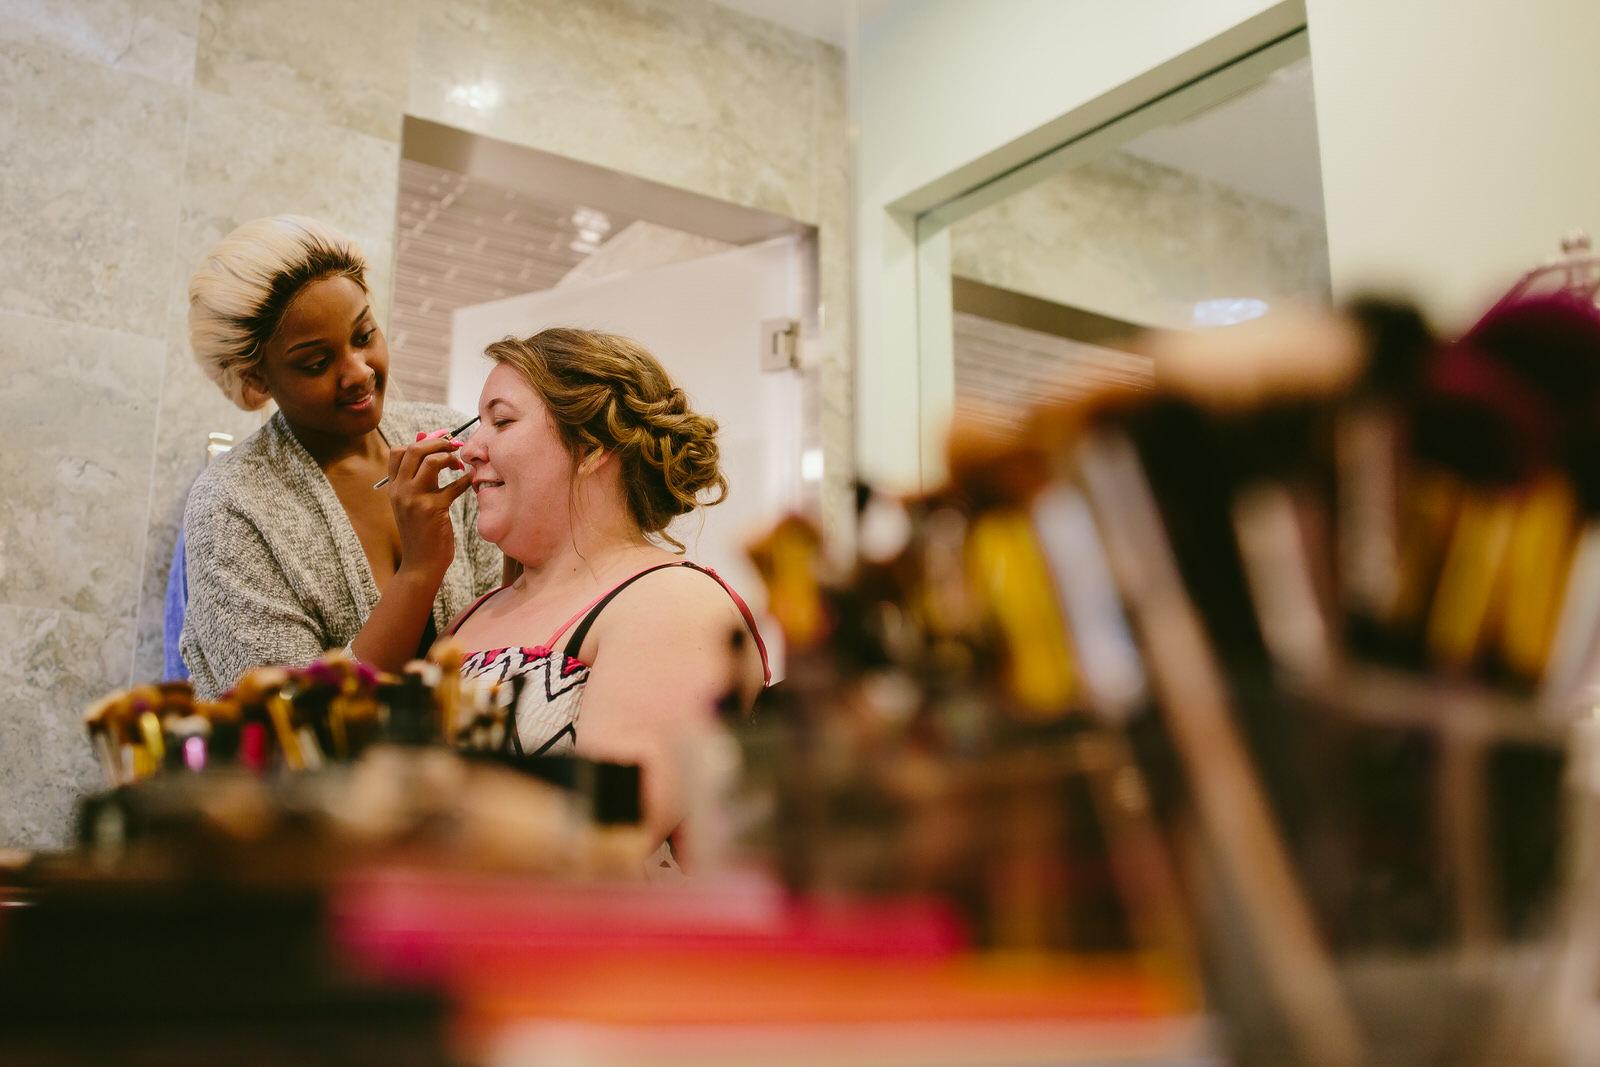 makeup-tiny-house-photo-getting-ready-florida-wedding.jpg